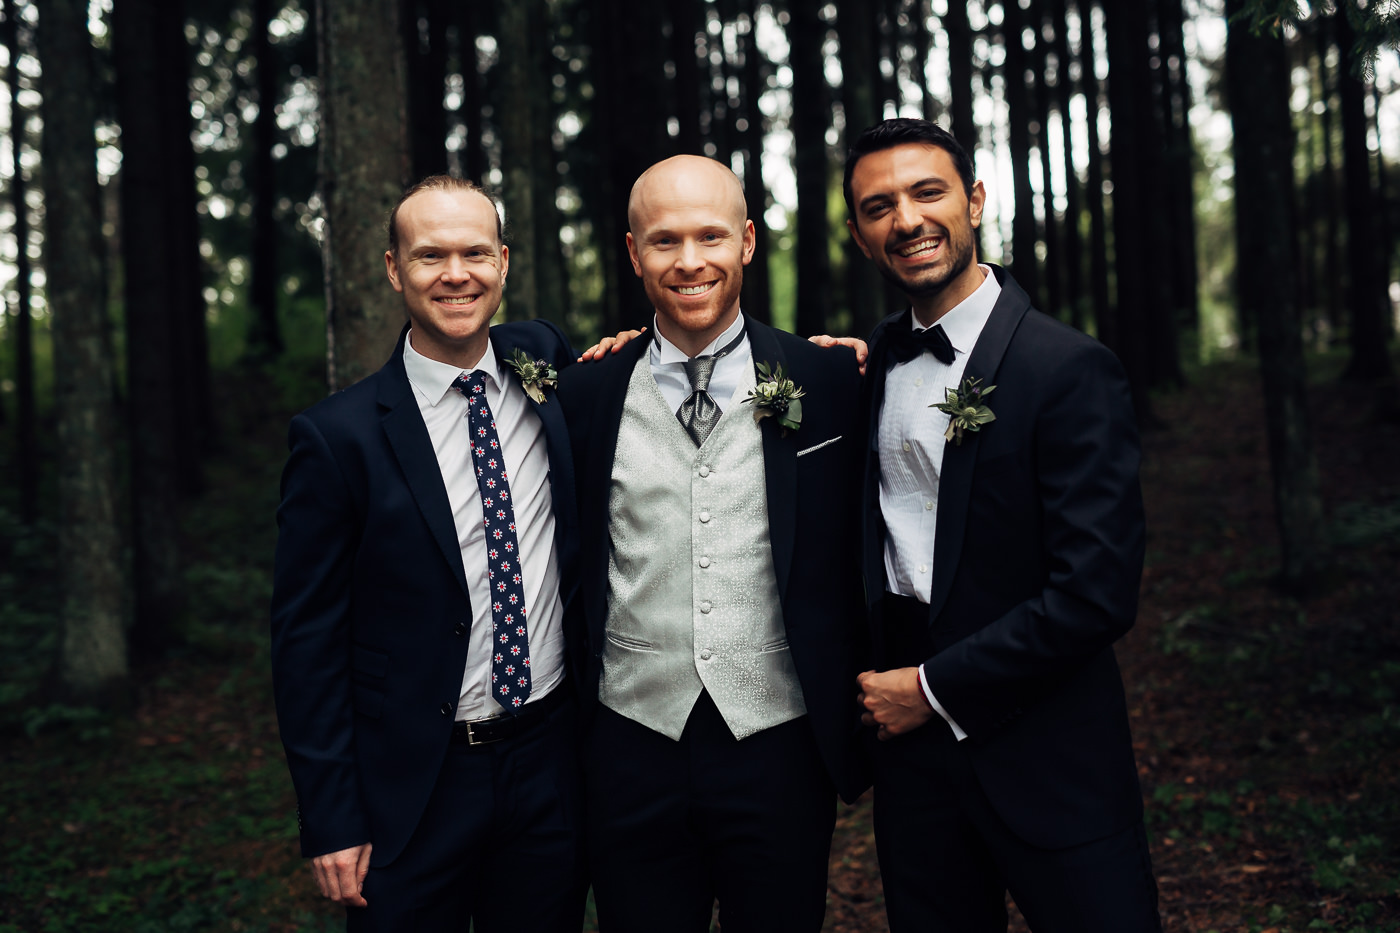 Malene & Ole Martin - elegant dansk- norskt bryllup i Oslo Bryllup Gamle Aker Oslo 28 Akershus